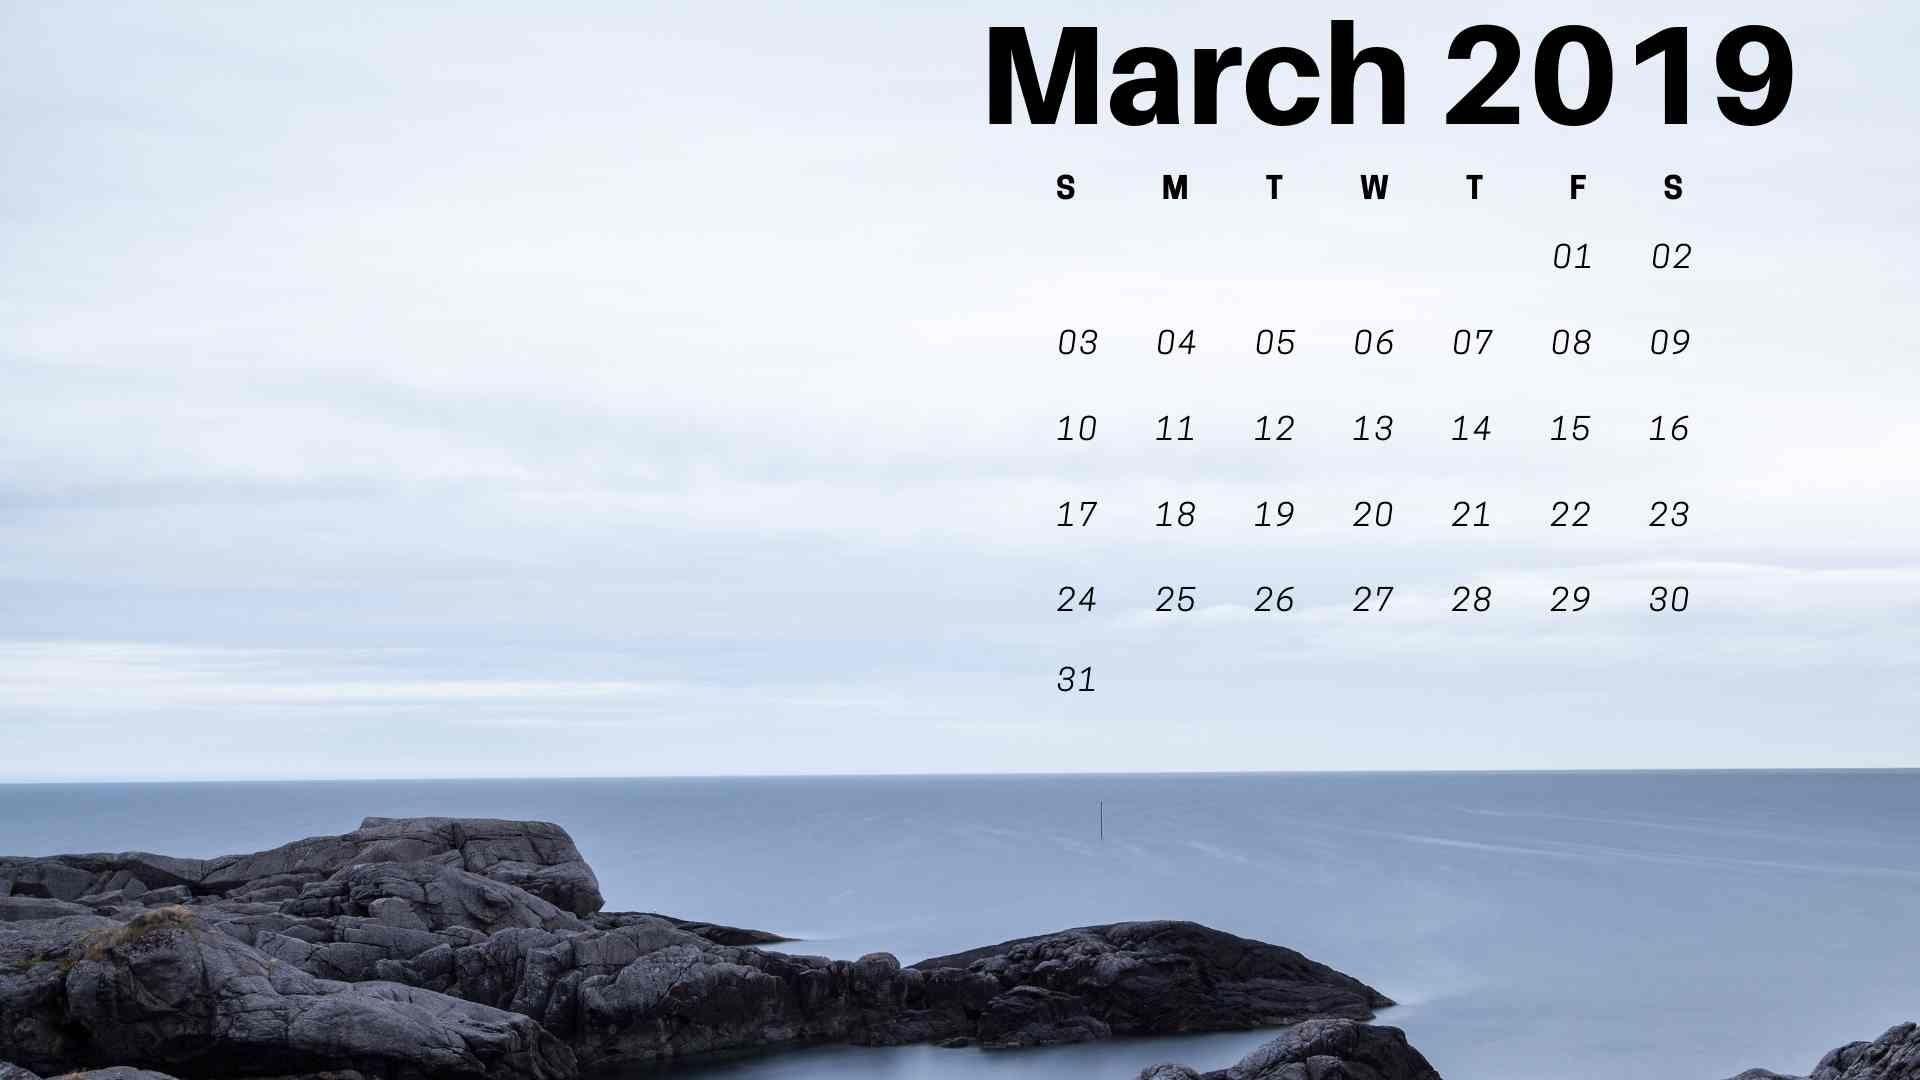 Calendario Lunar 2019 Brasil Más Populares March 2019 Calendar Wallpaper Desktop March Calendar Calenda2019 Of Calendario Lunar 2019 Brasil Recientes Watch Cbs Pga tour the northern Trust Cbssports Cbssports